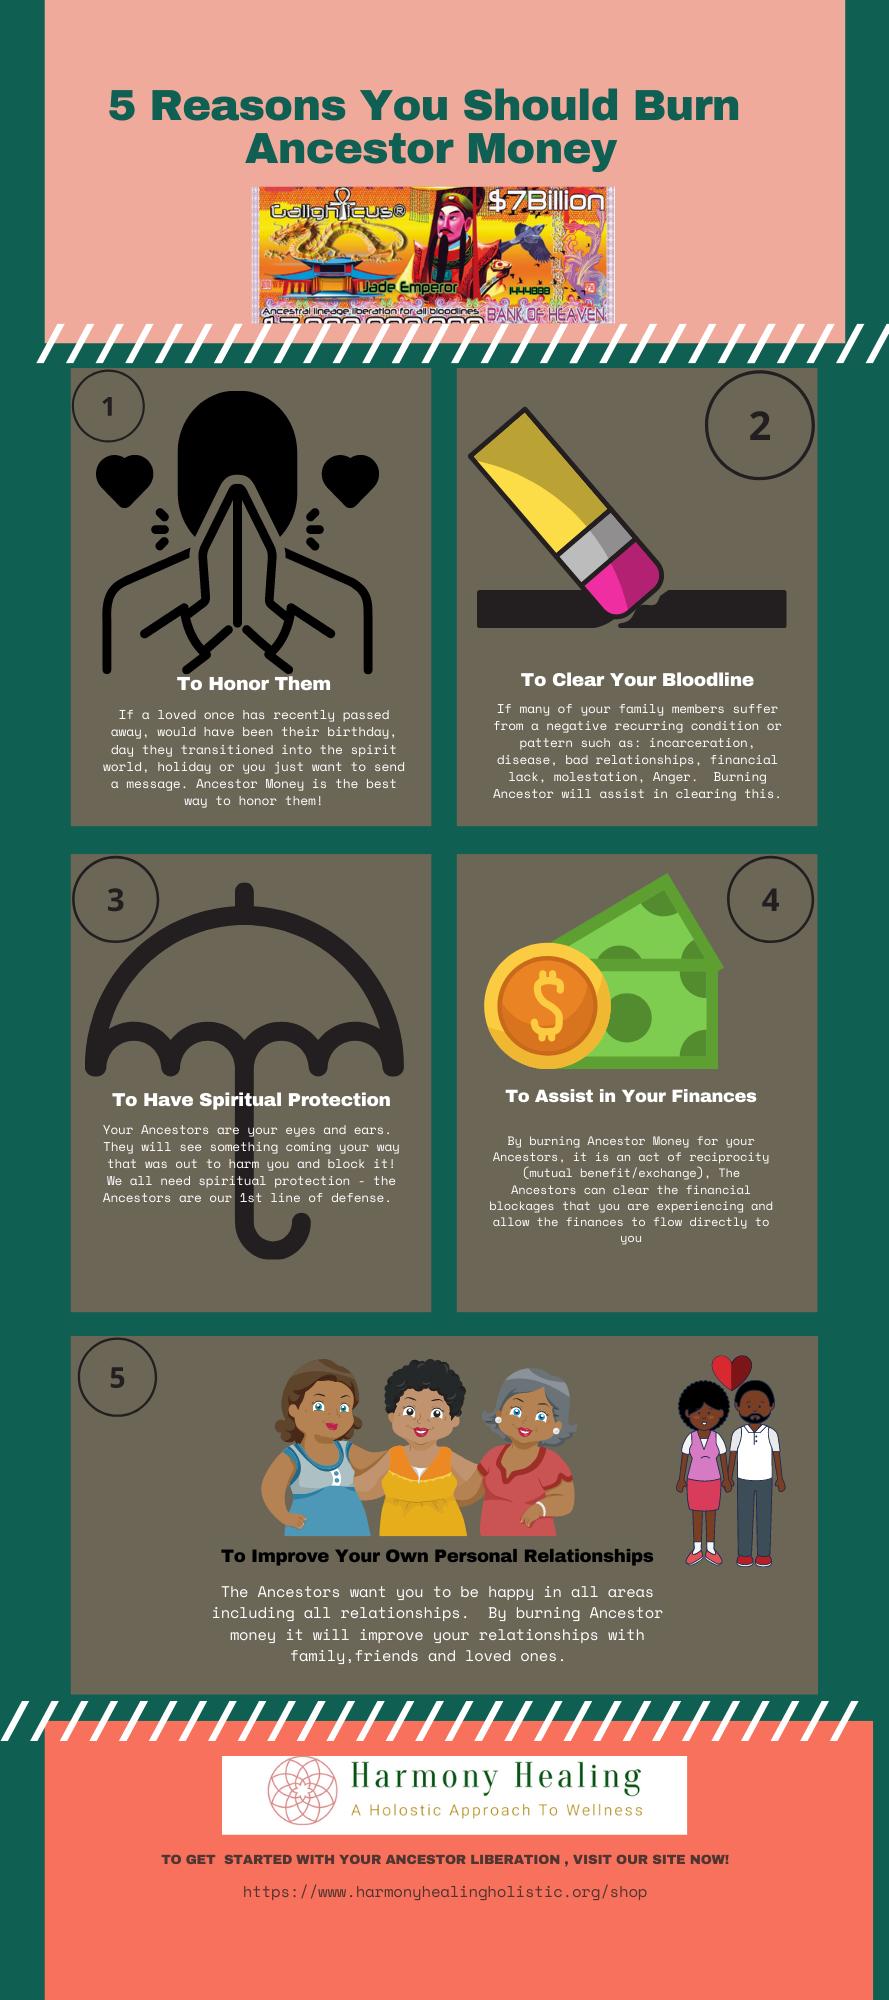 Why You Should Burn Ancestor Money